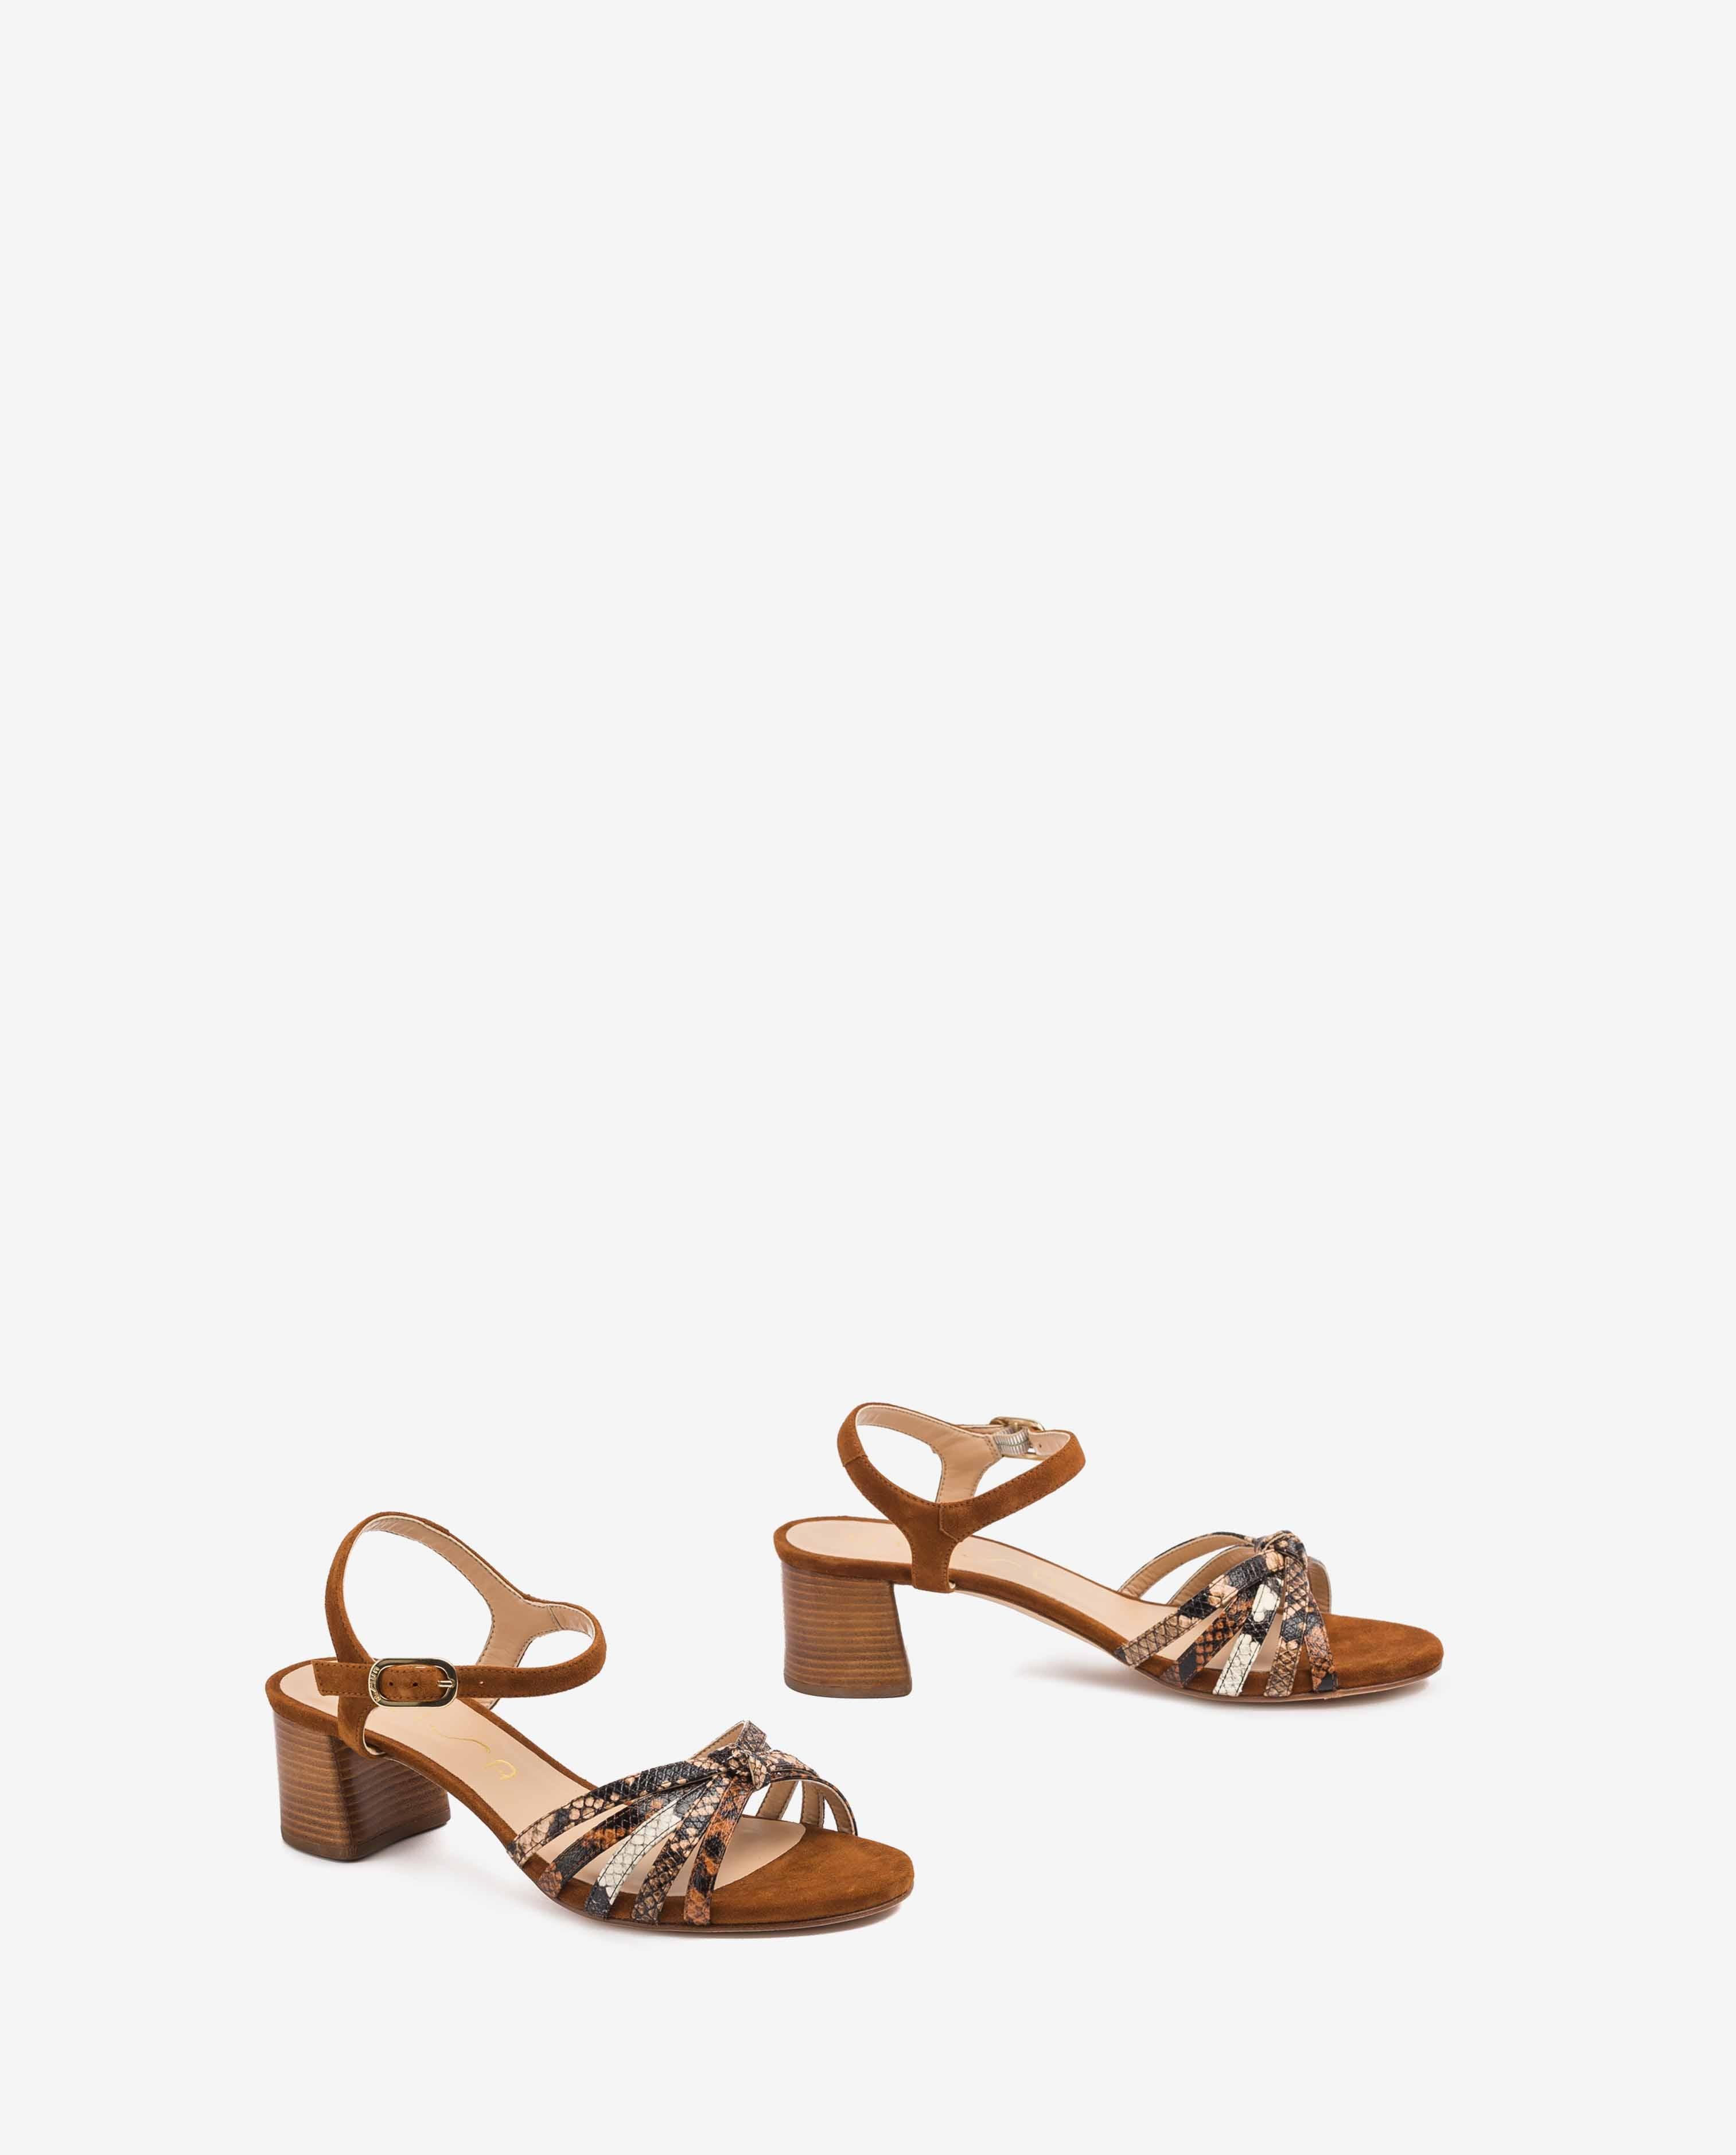 UNISA Sandaletten mit kontrastierenden Riemen in Snake-Print GRATA_VIP_KS tek/sun/na 5